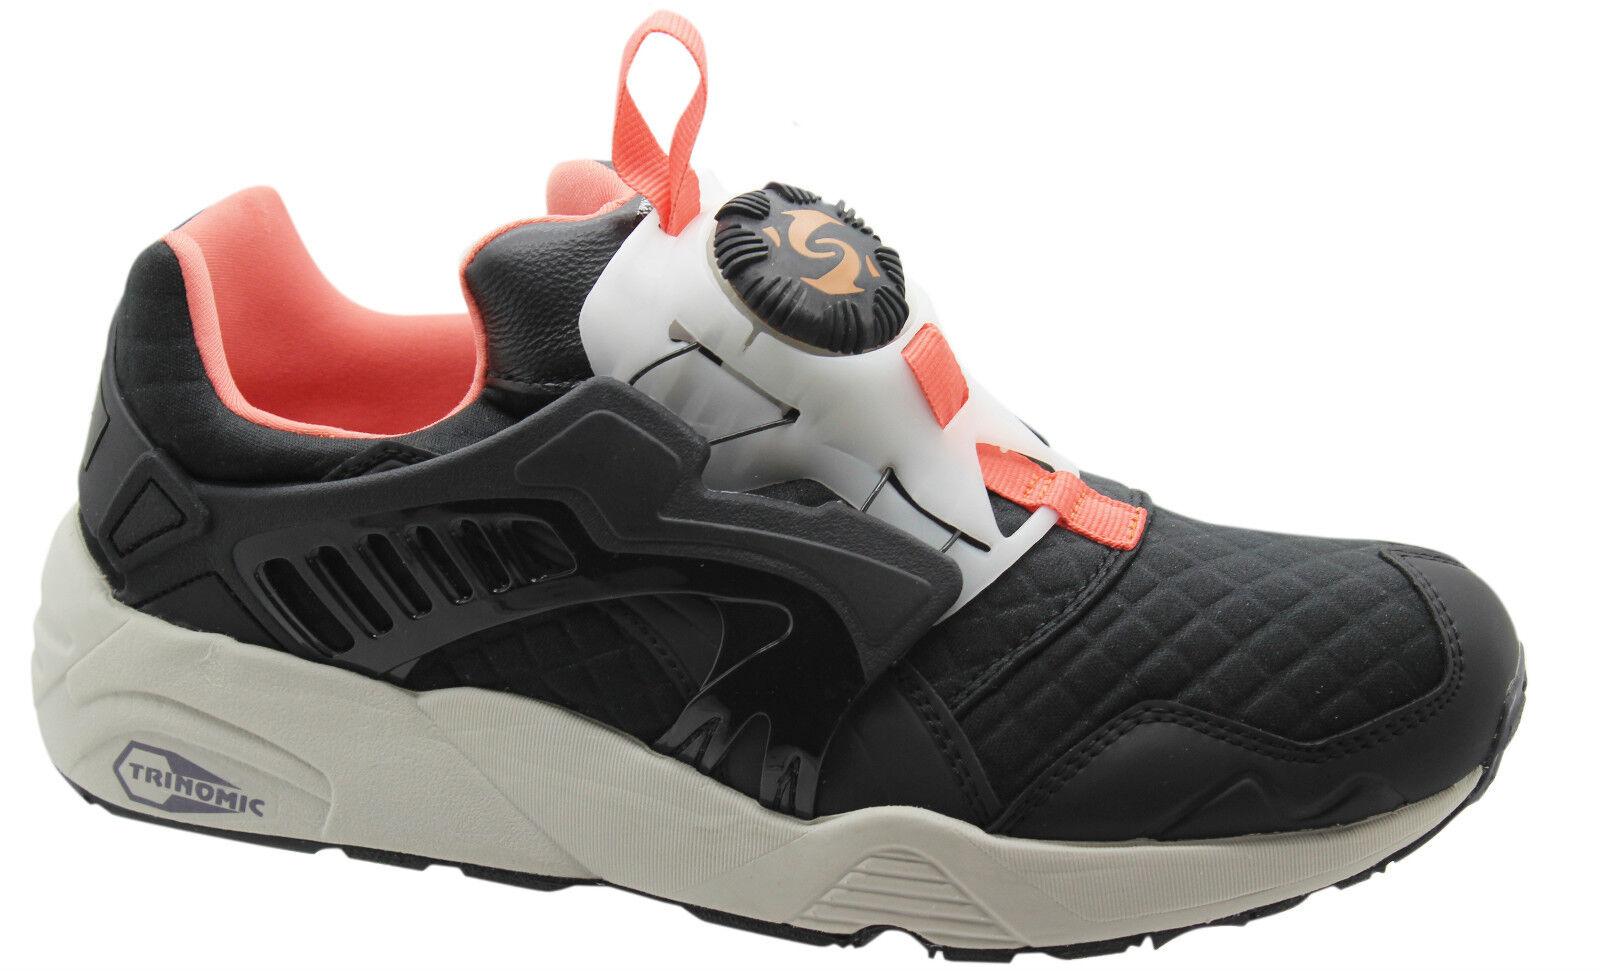 Puma Trinomic Disc Blaze Emboss Mens Trainers Slip On Shoes Black 359358 01 D73